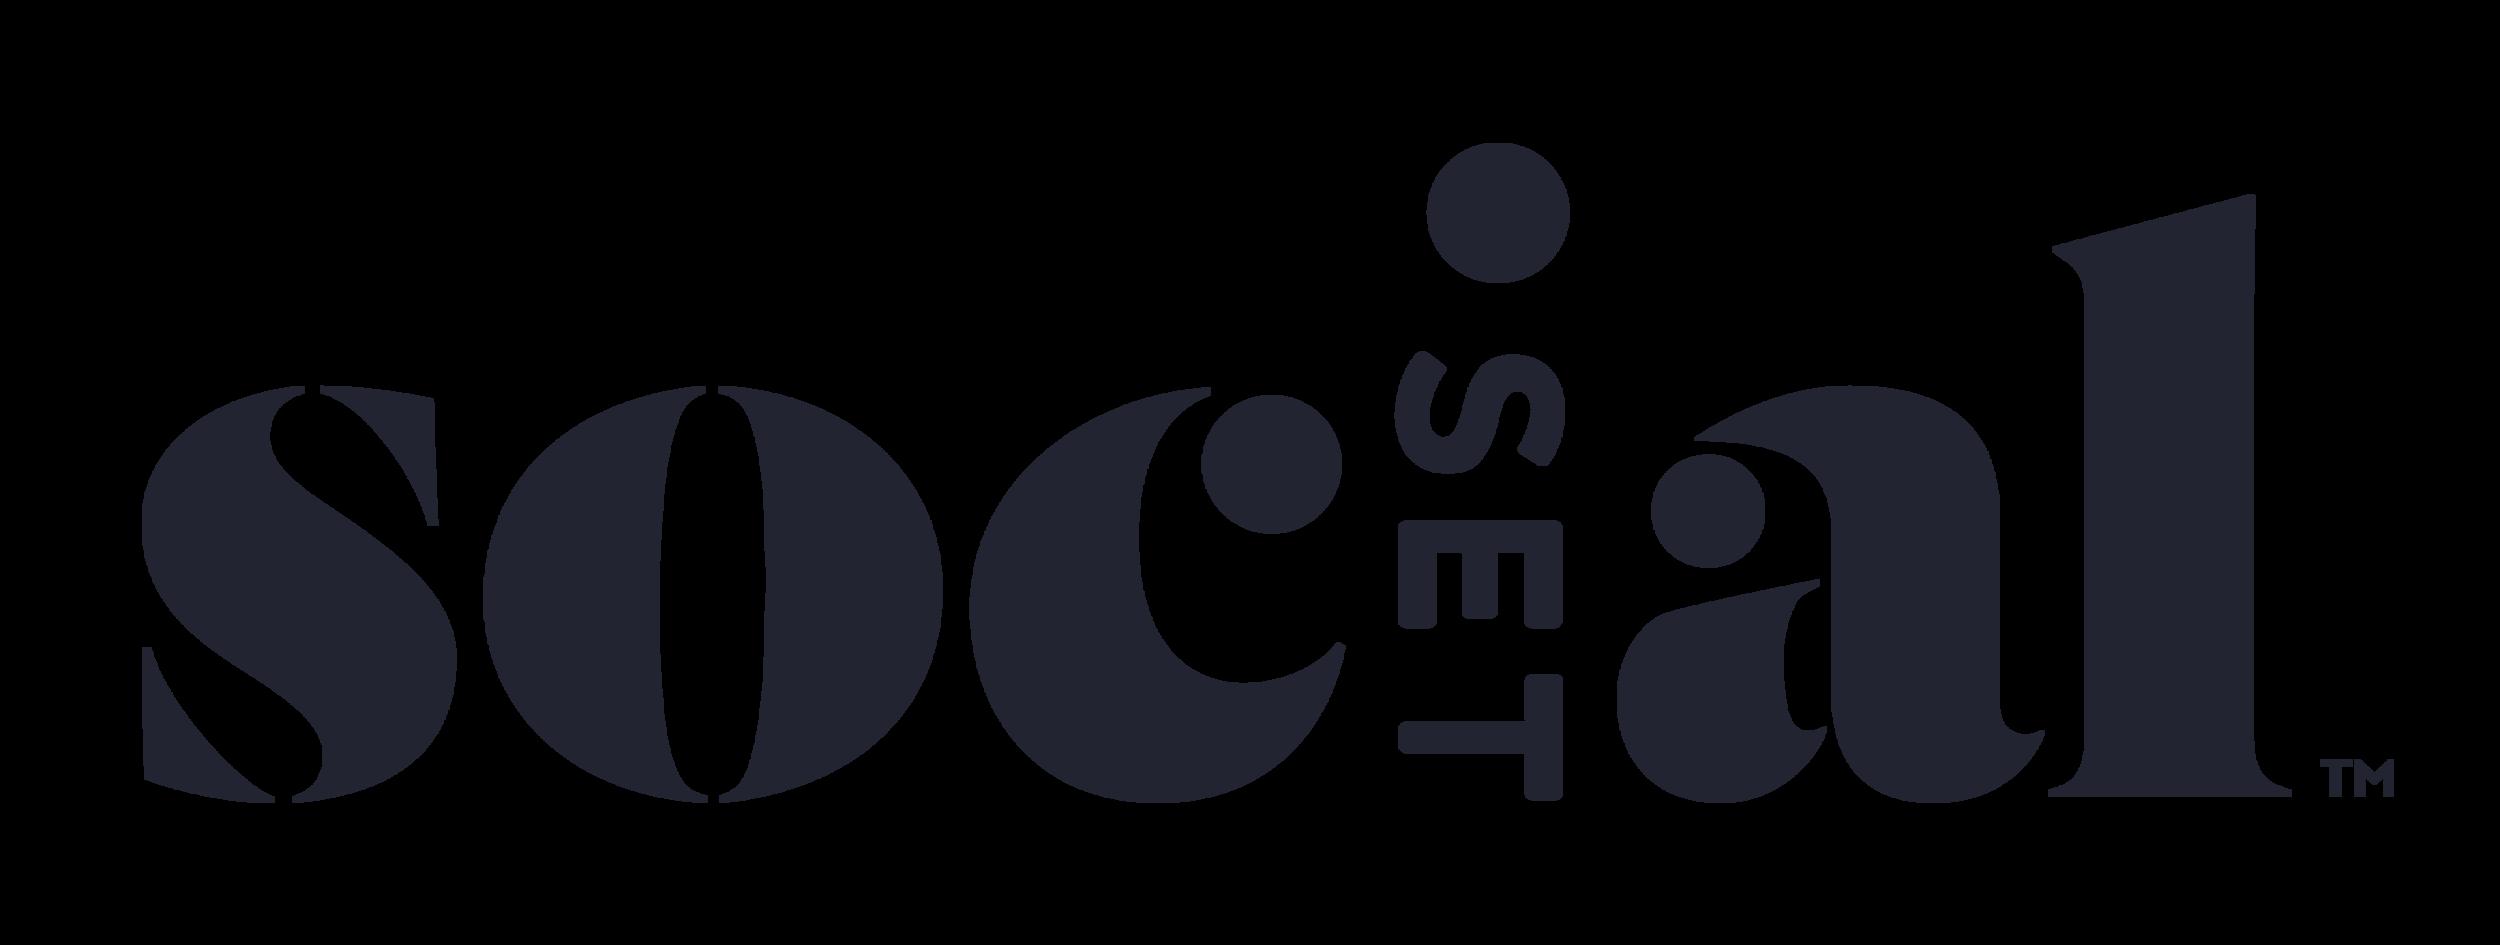 SocialSet_Logo_single.png